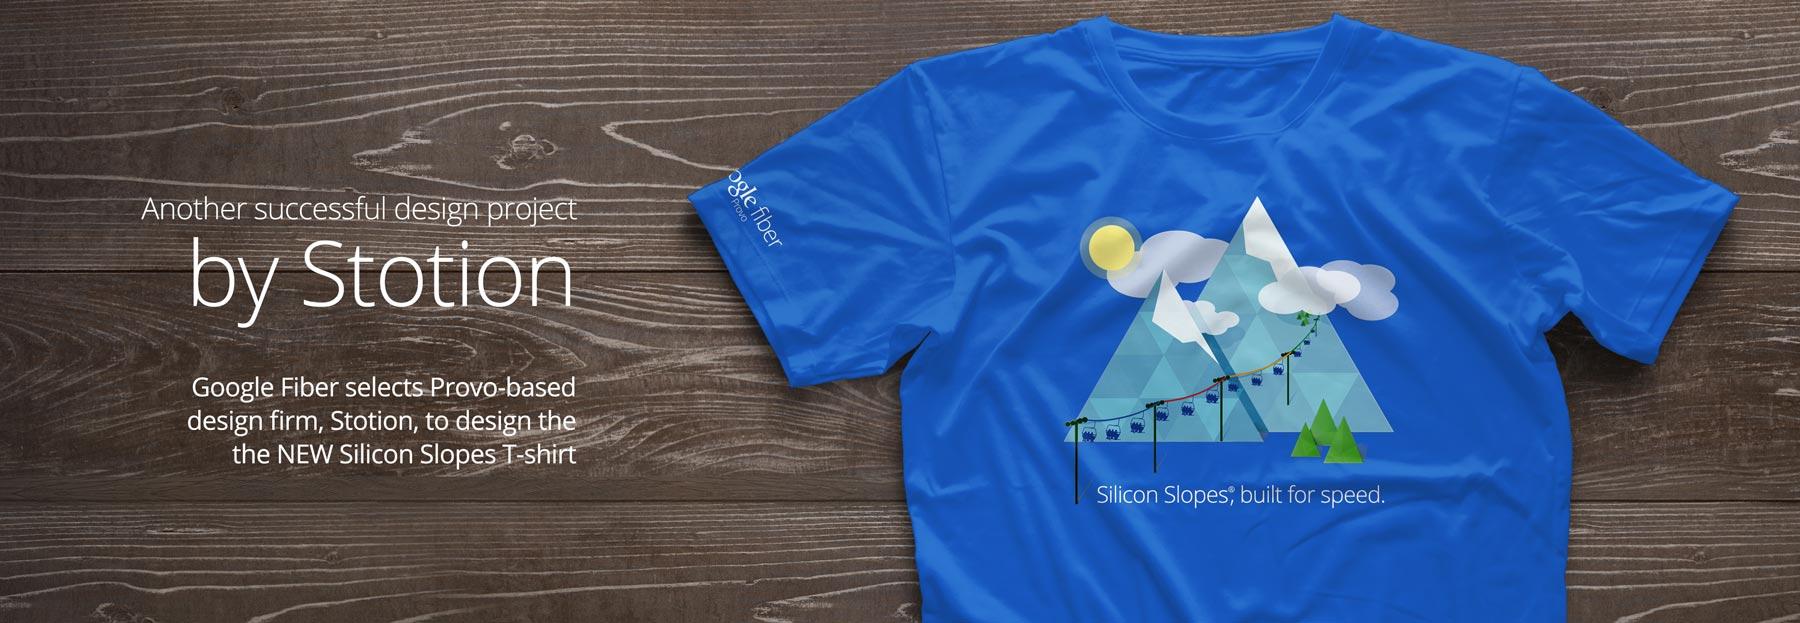 Provo T-shirt design